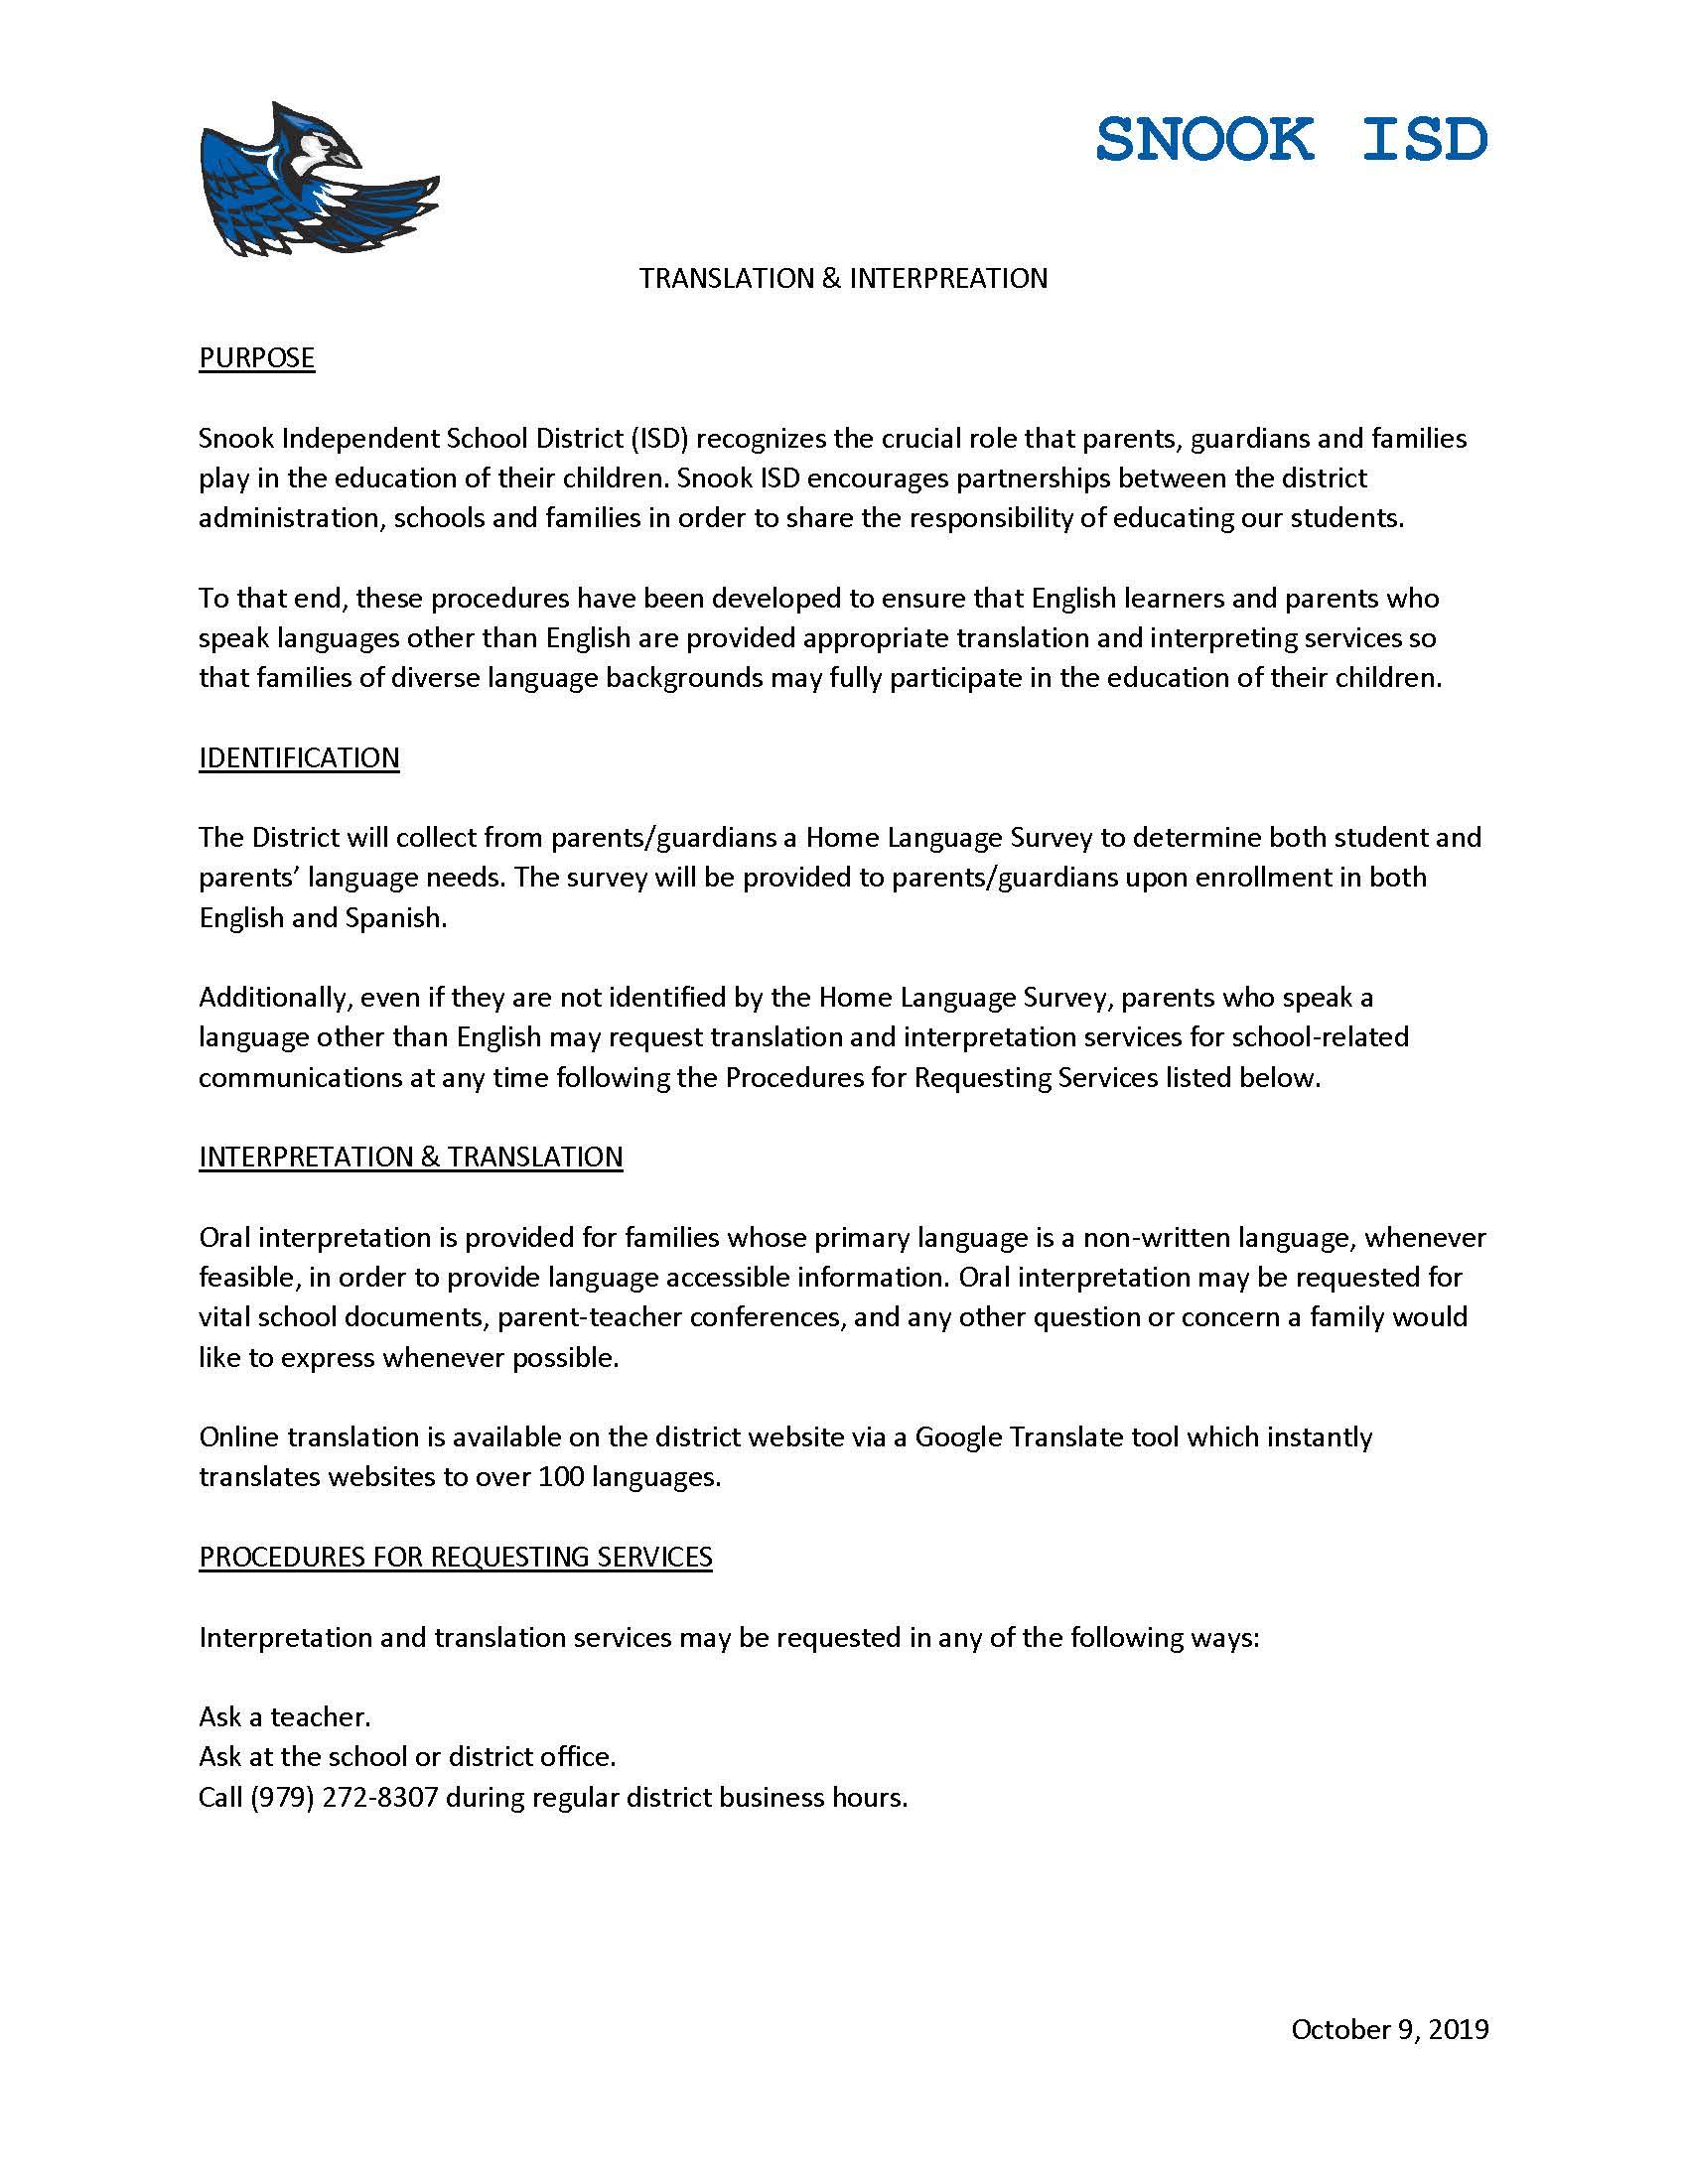 Snook ISD Translation & Interpretation